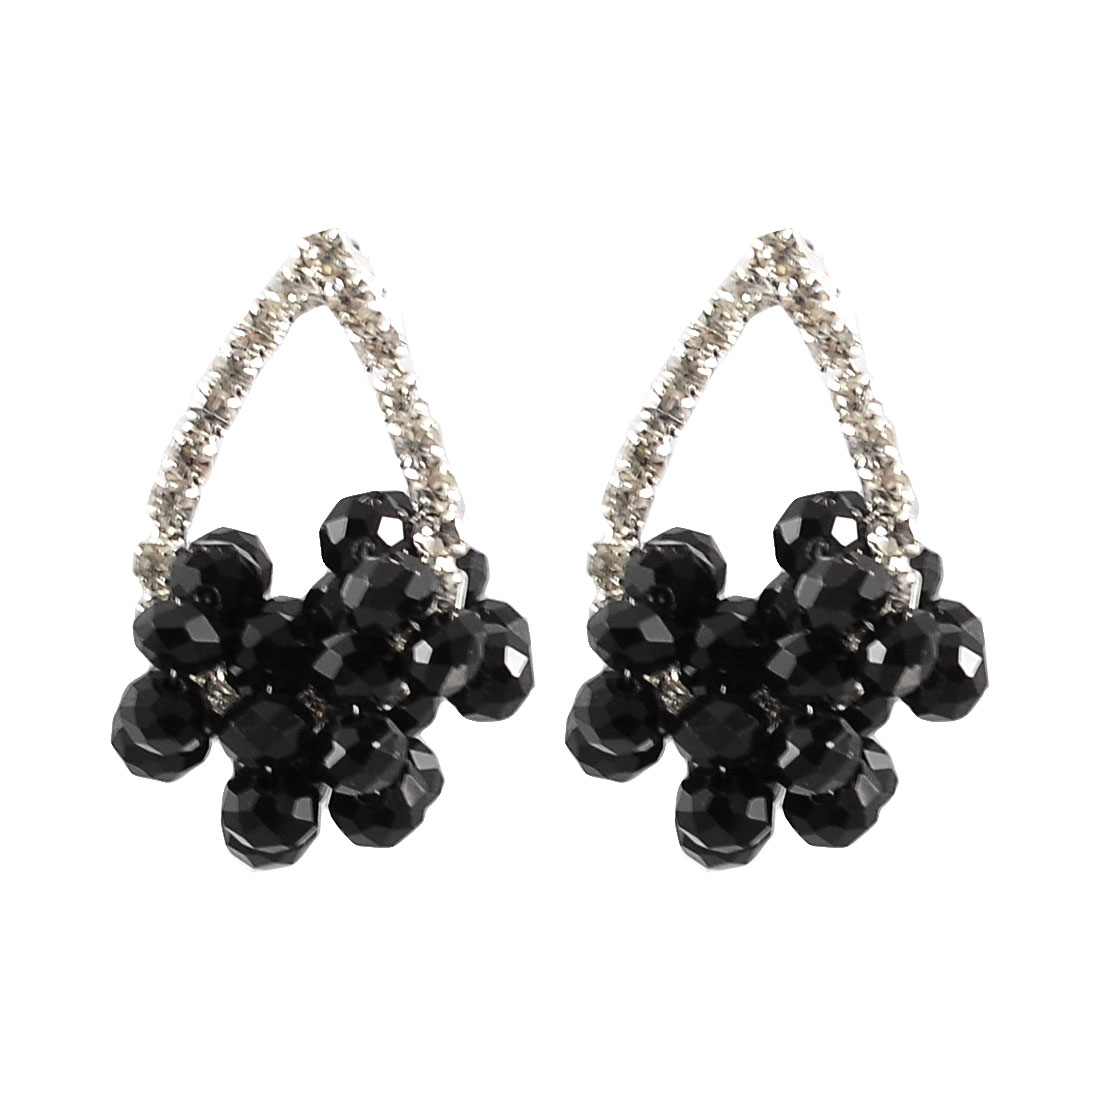 Woman Black Crystal Decor Rhinestone Surrounding Earbob Stud Earrings Gift Pair